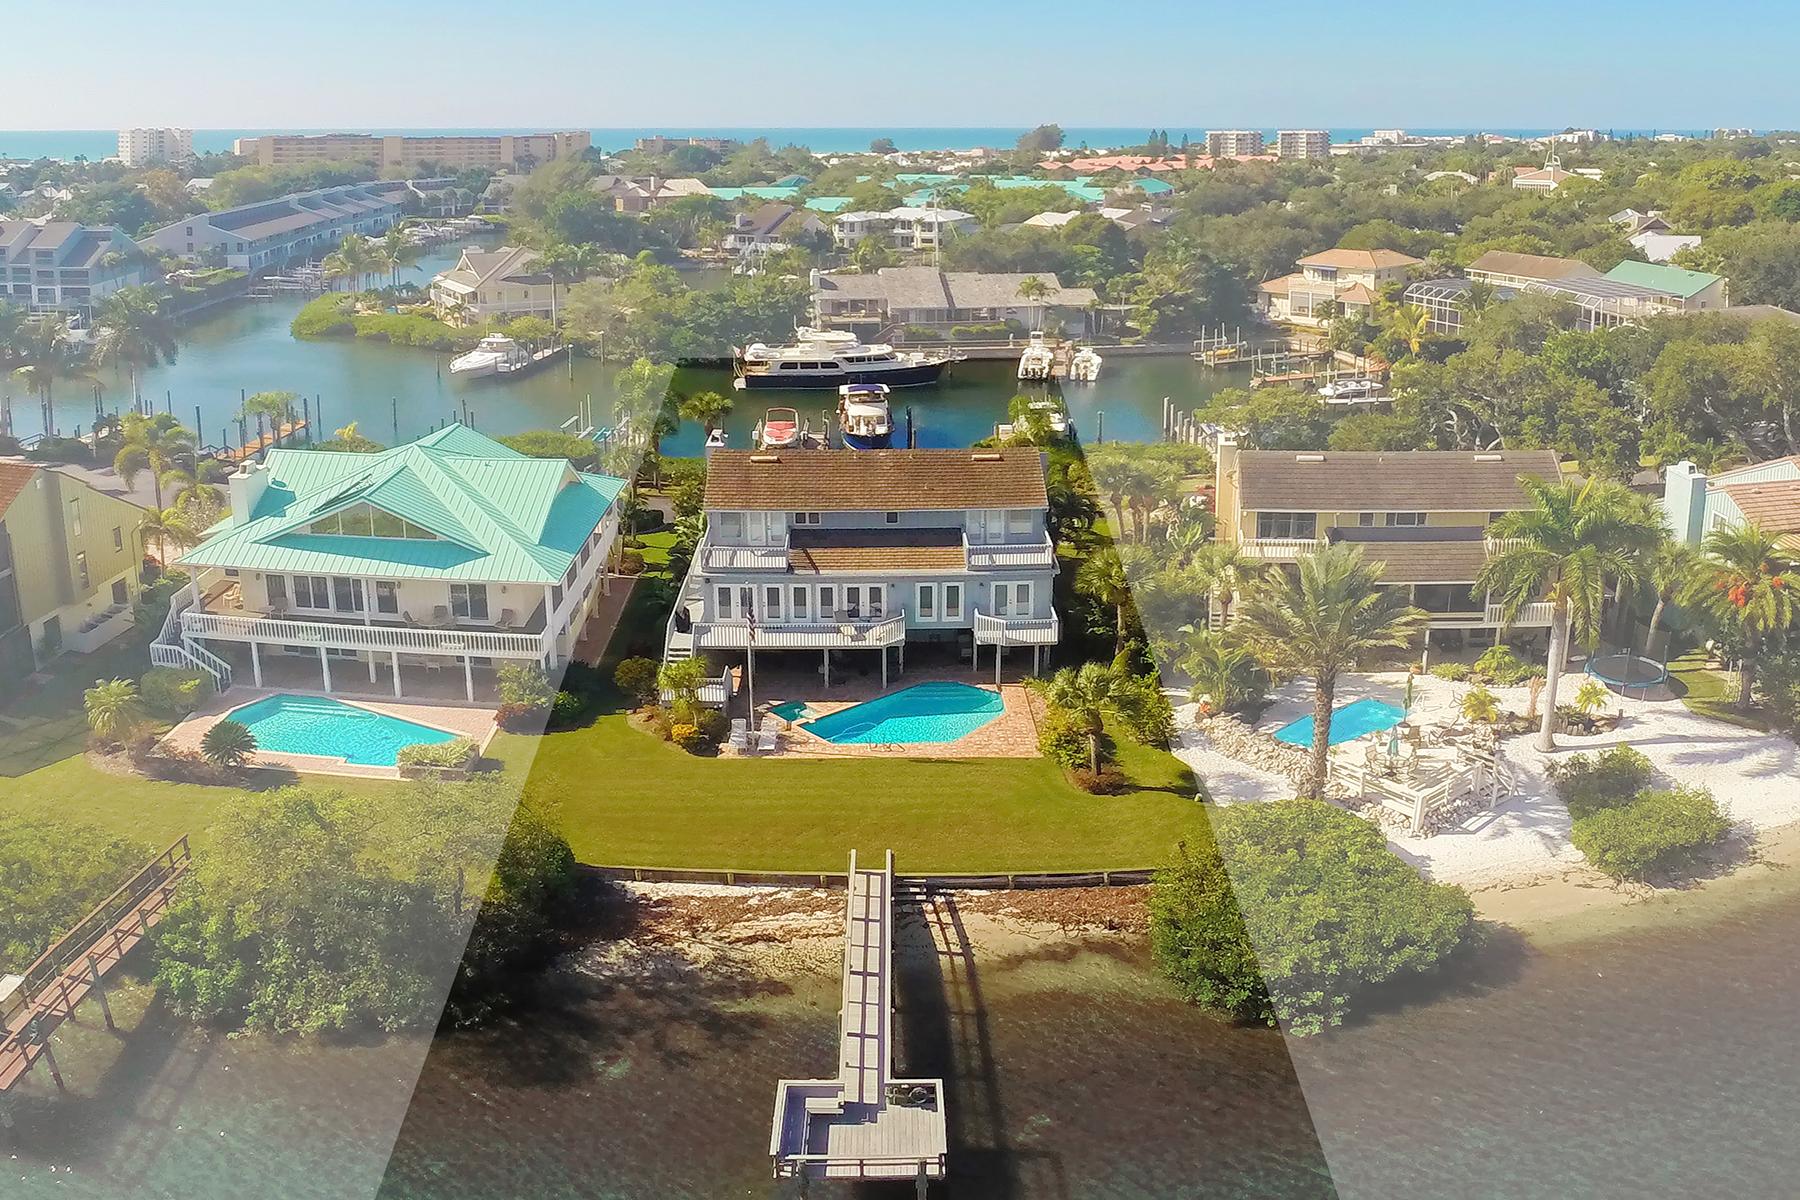 Single Family Home for Sale at RIEGELS LANDING 1259 Riegels Landing Dr Sarasota, Florida 34242 United States